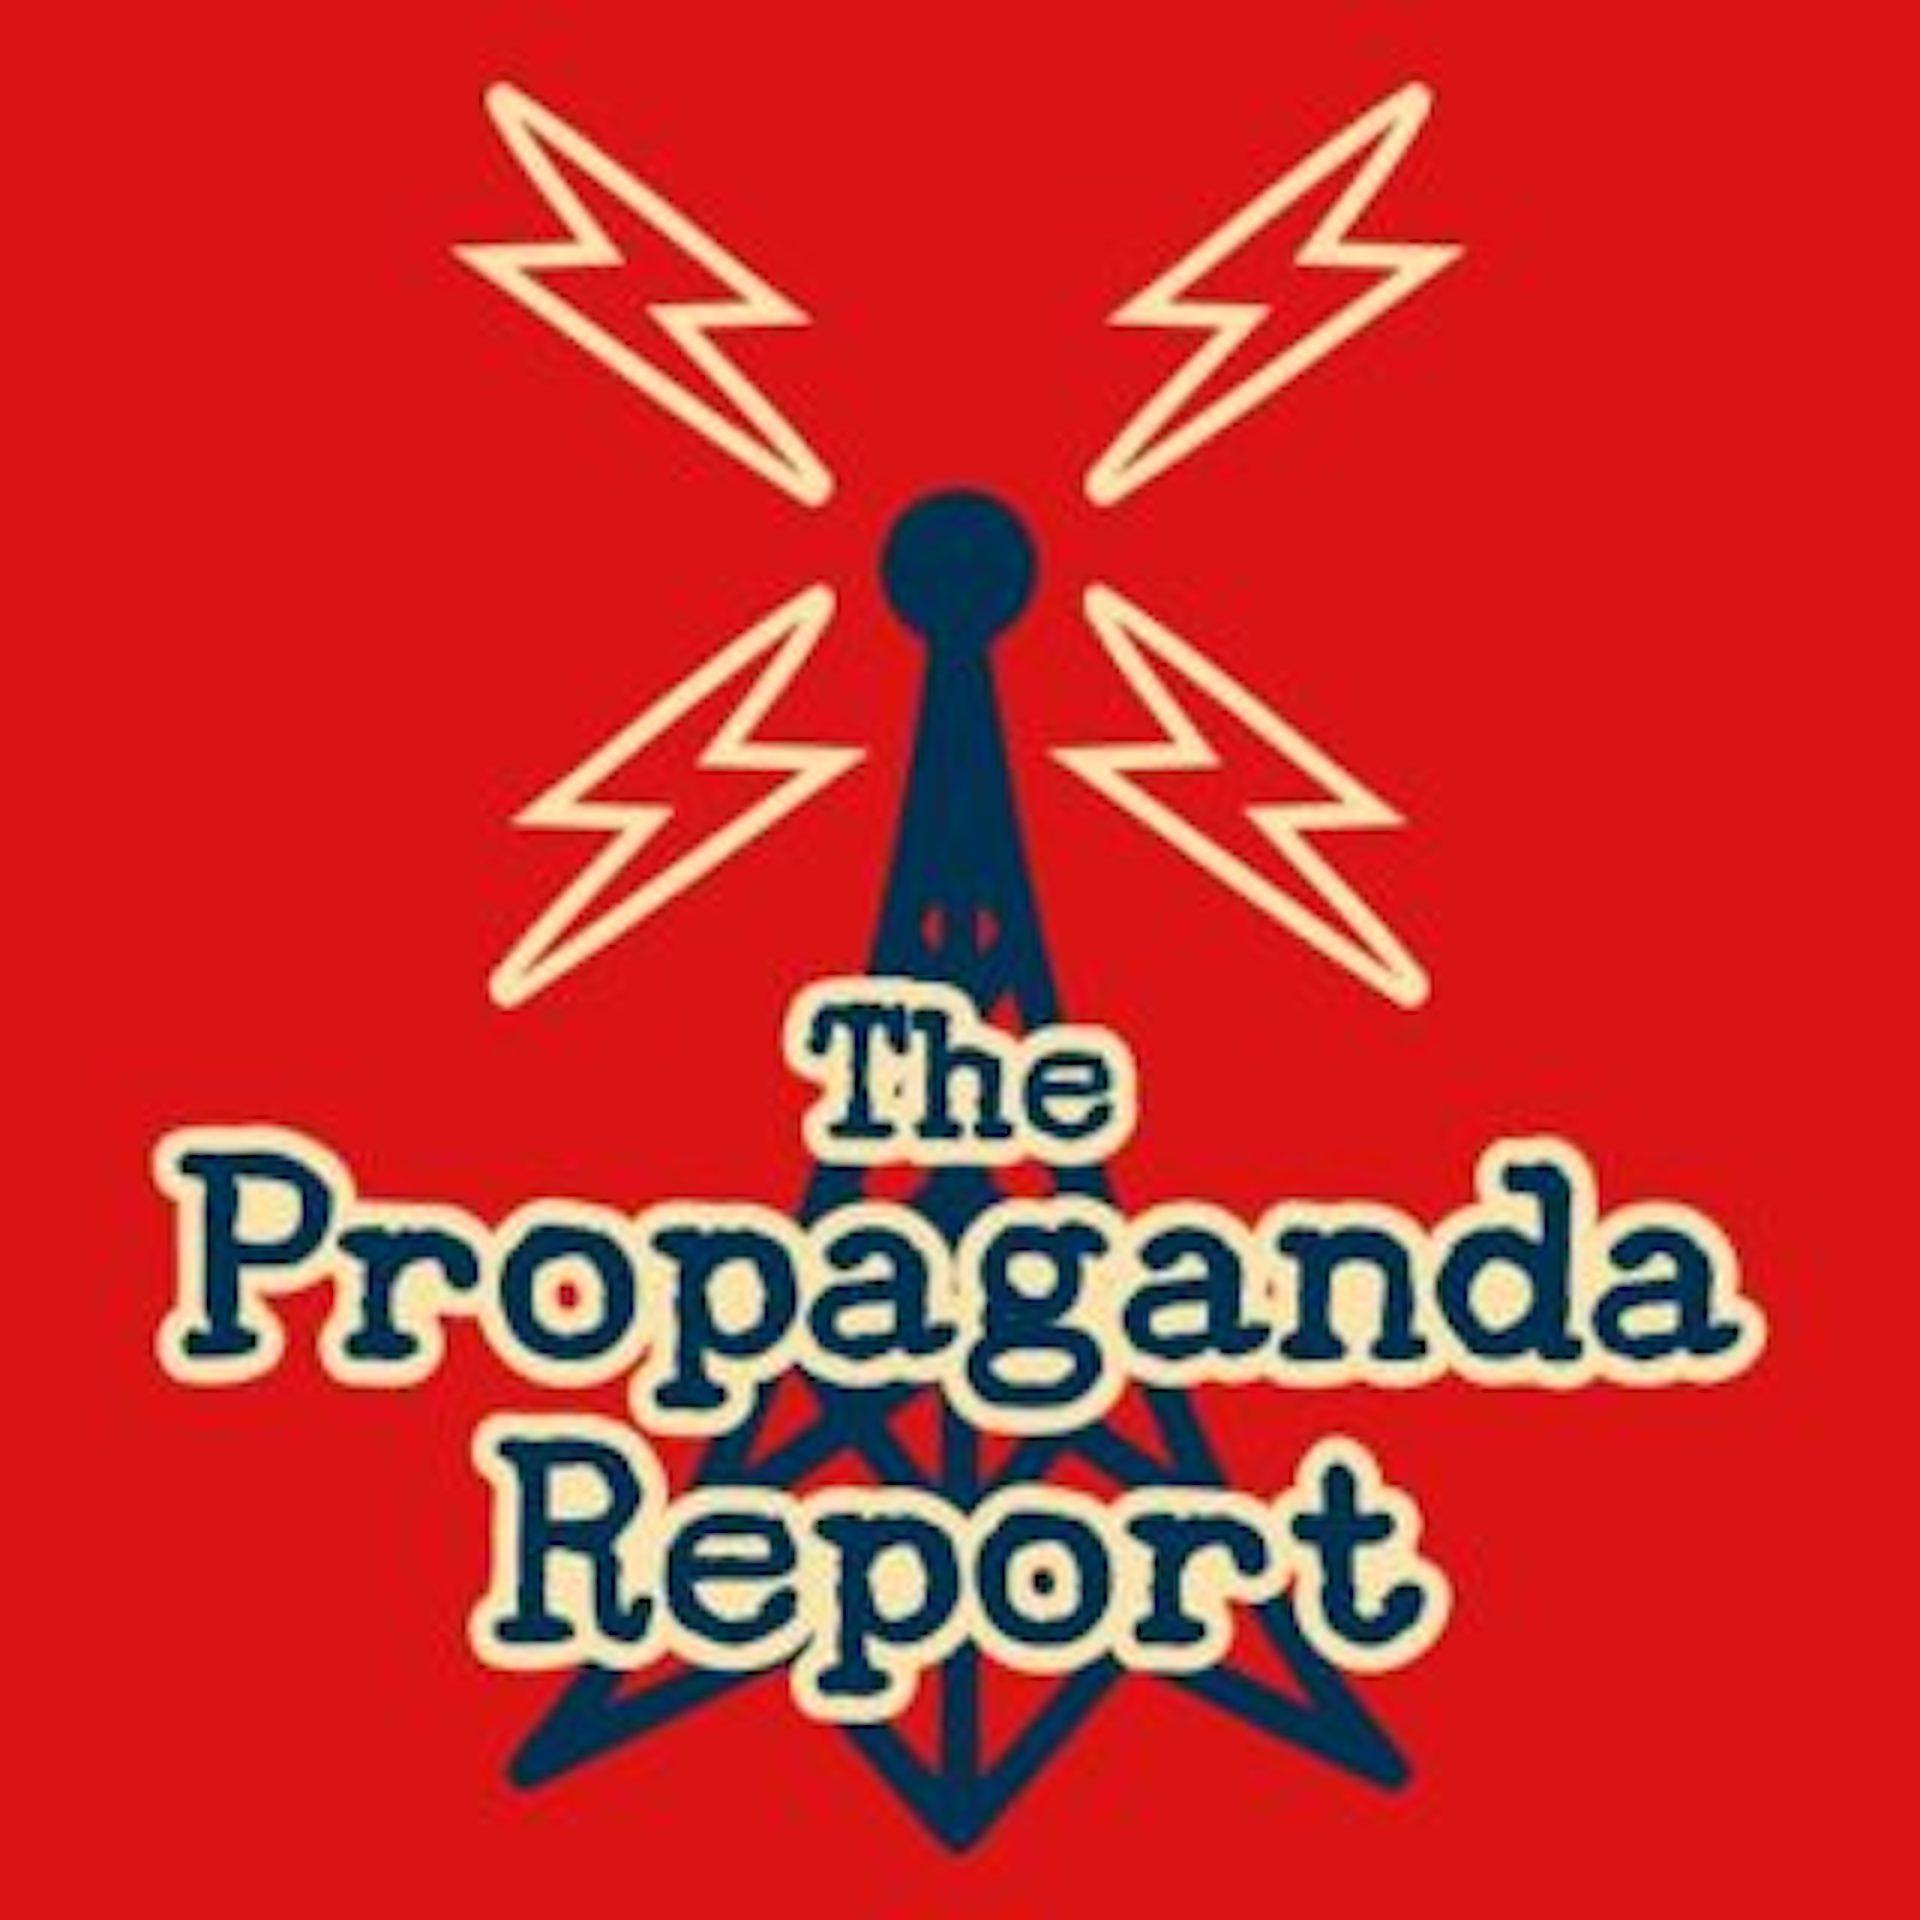 The Propaganda Report show art